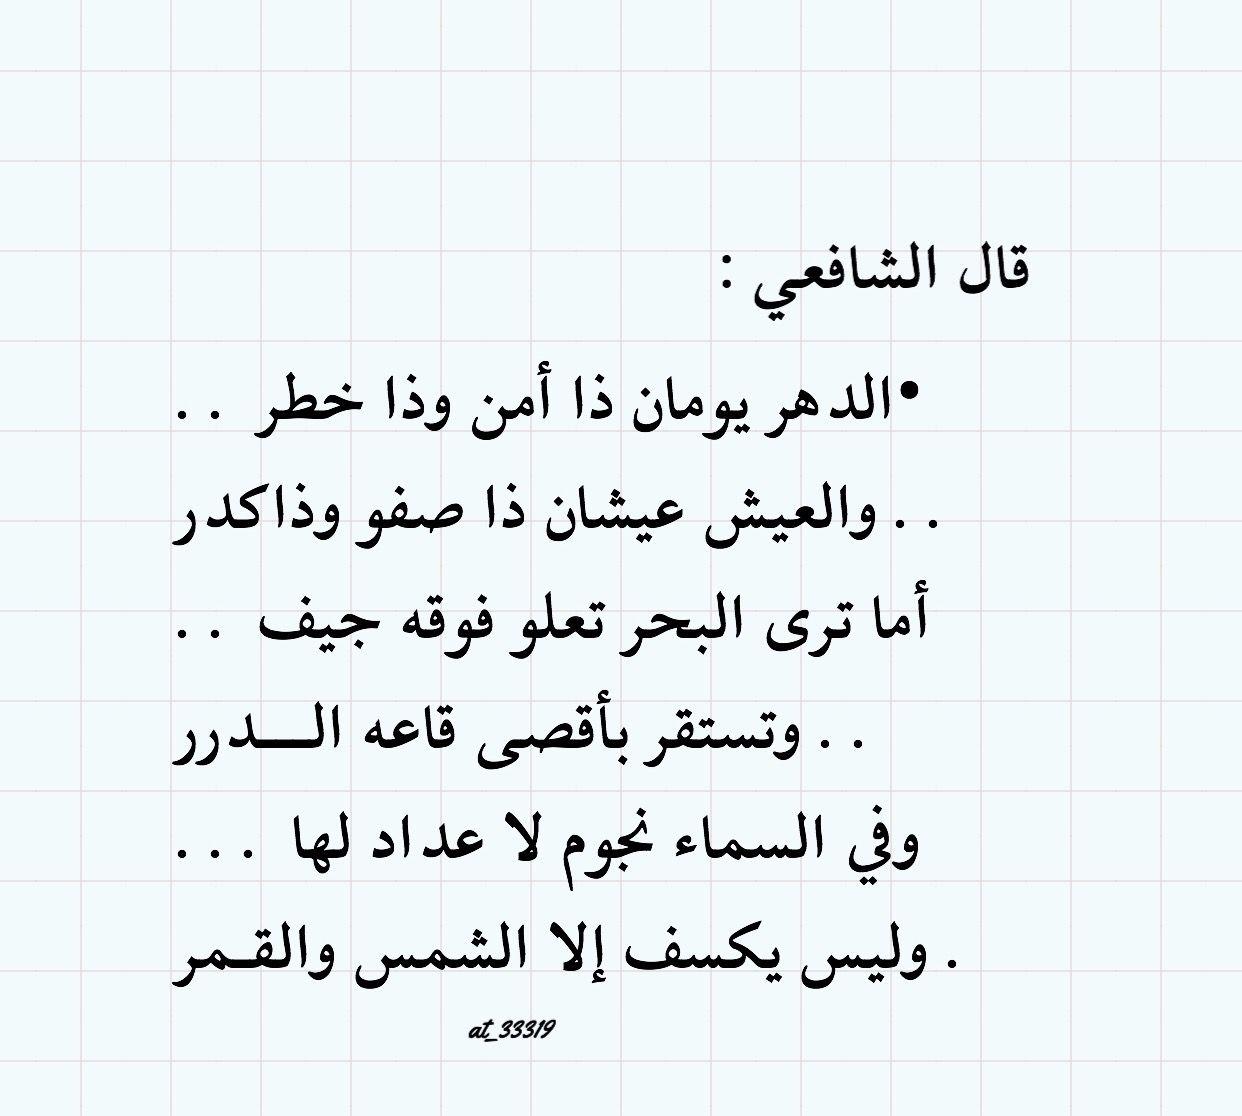 من اقول الشافعي Arabic Quotes Arabic Words Photo Quotes